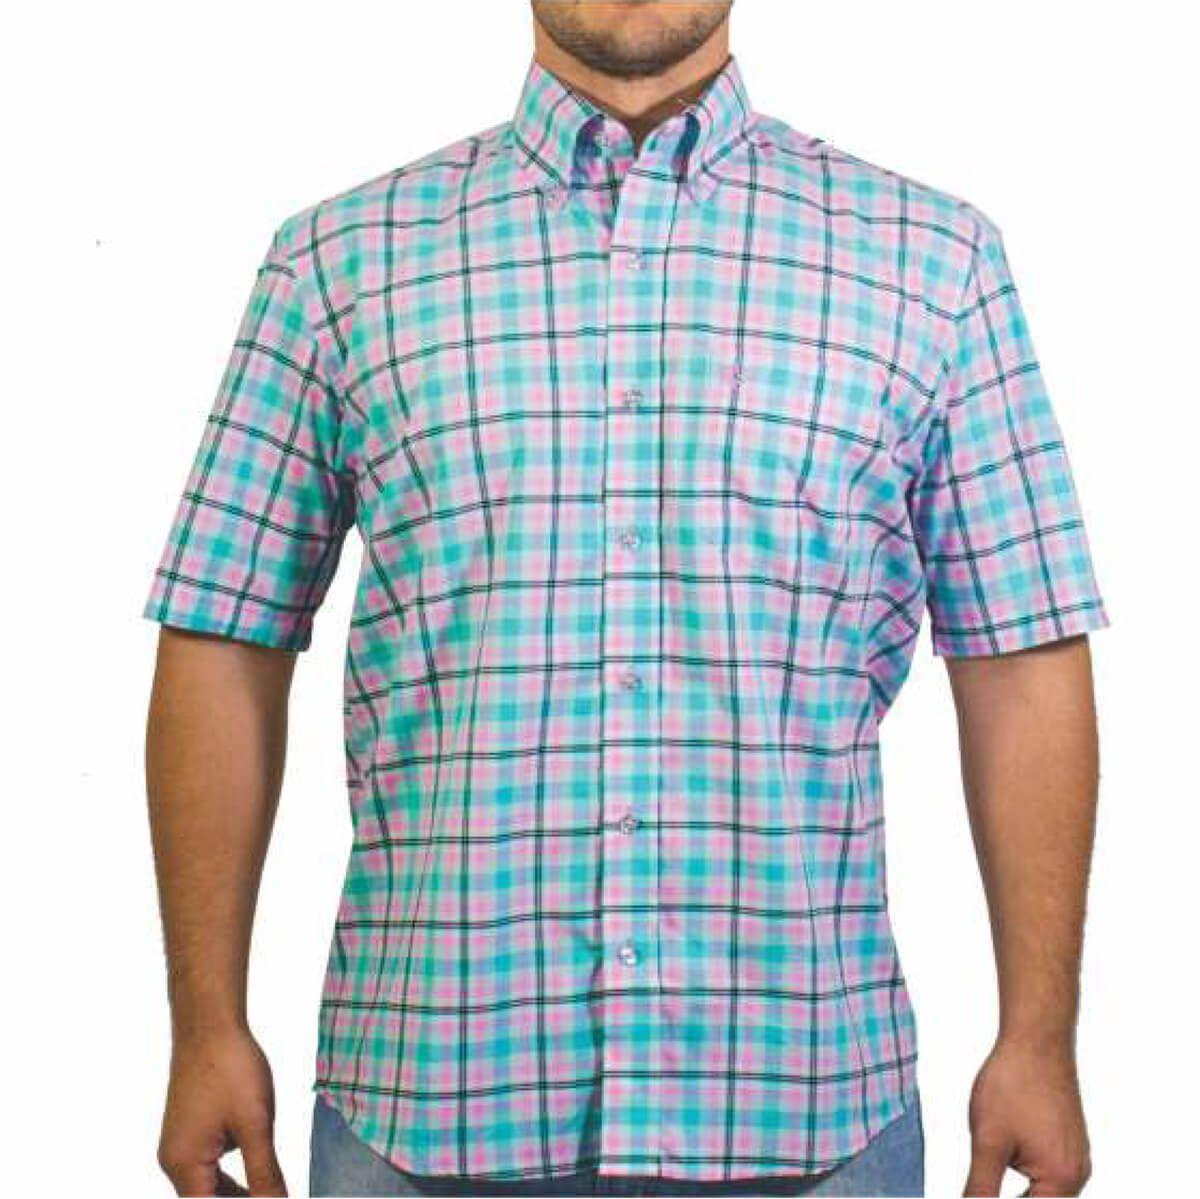 Camisa Tuff Masculina Xadrez Branca Listra Rosas E Verde - Arena Country  Echaporã 7d1acd78233